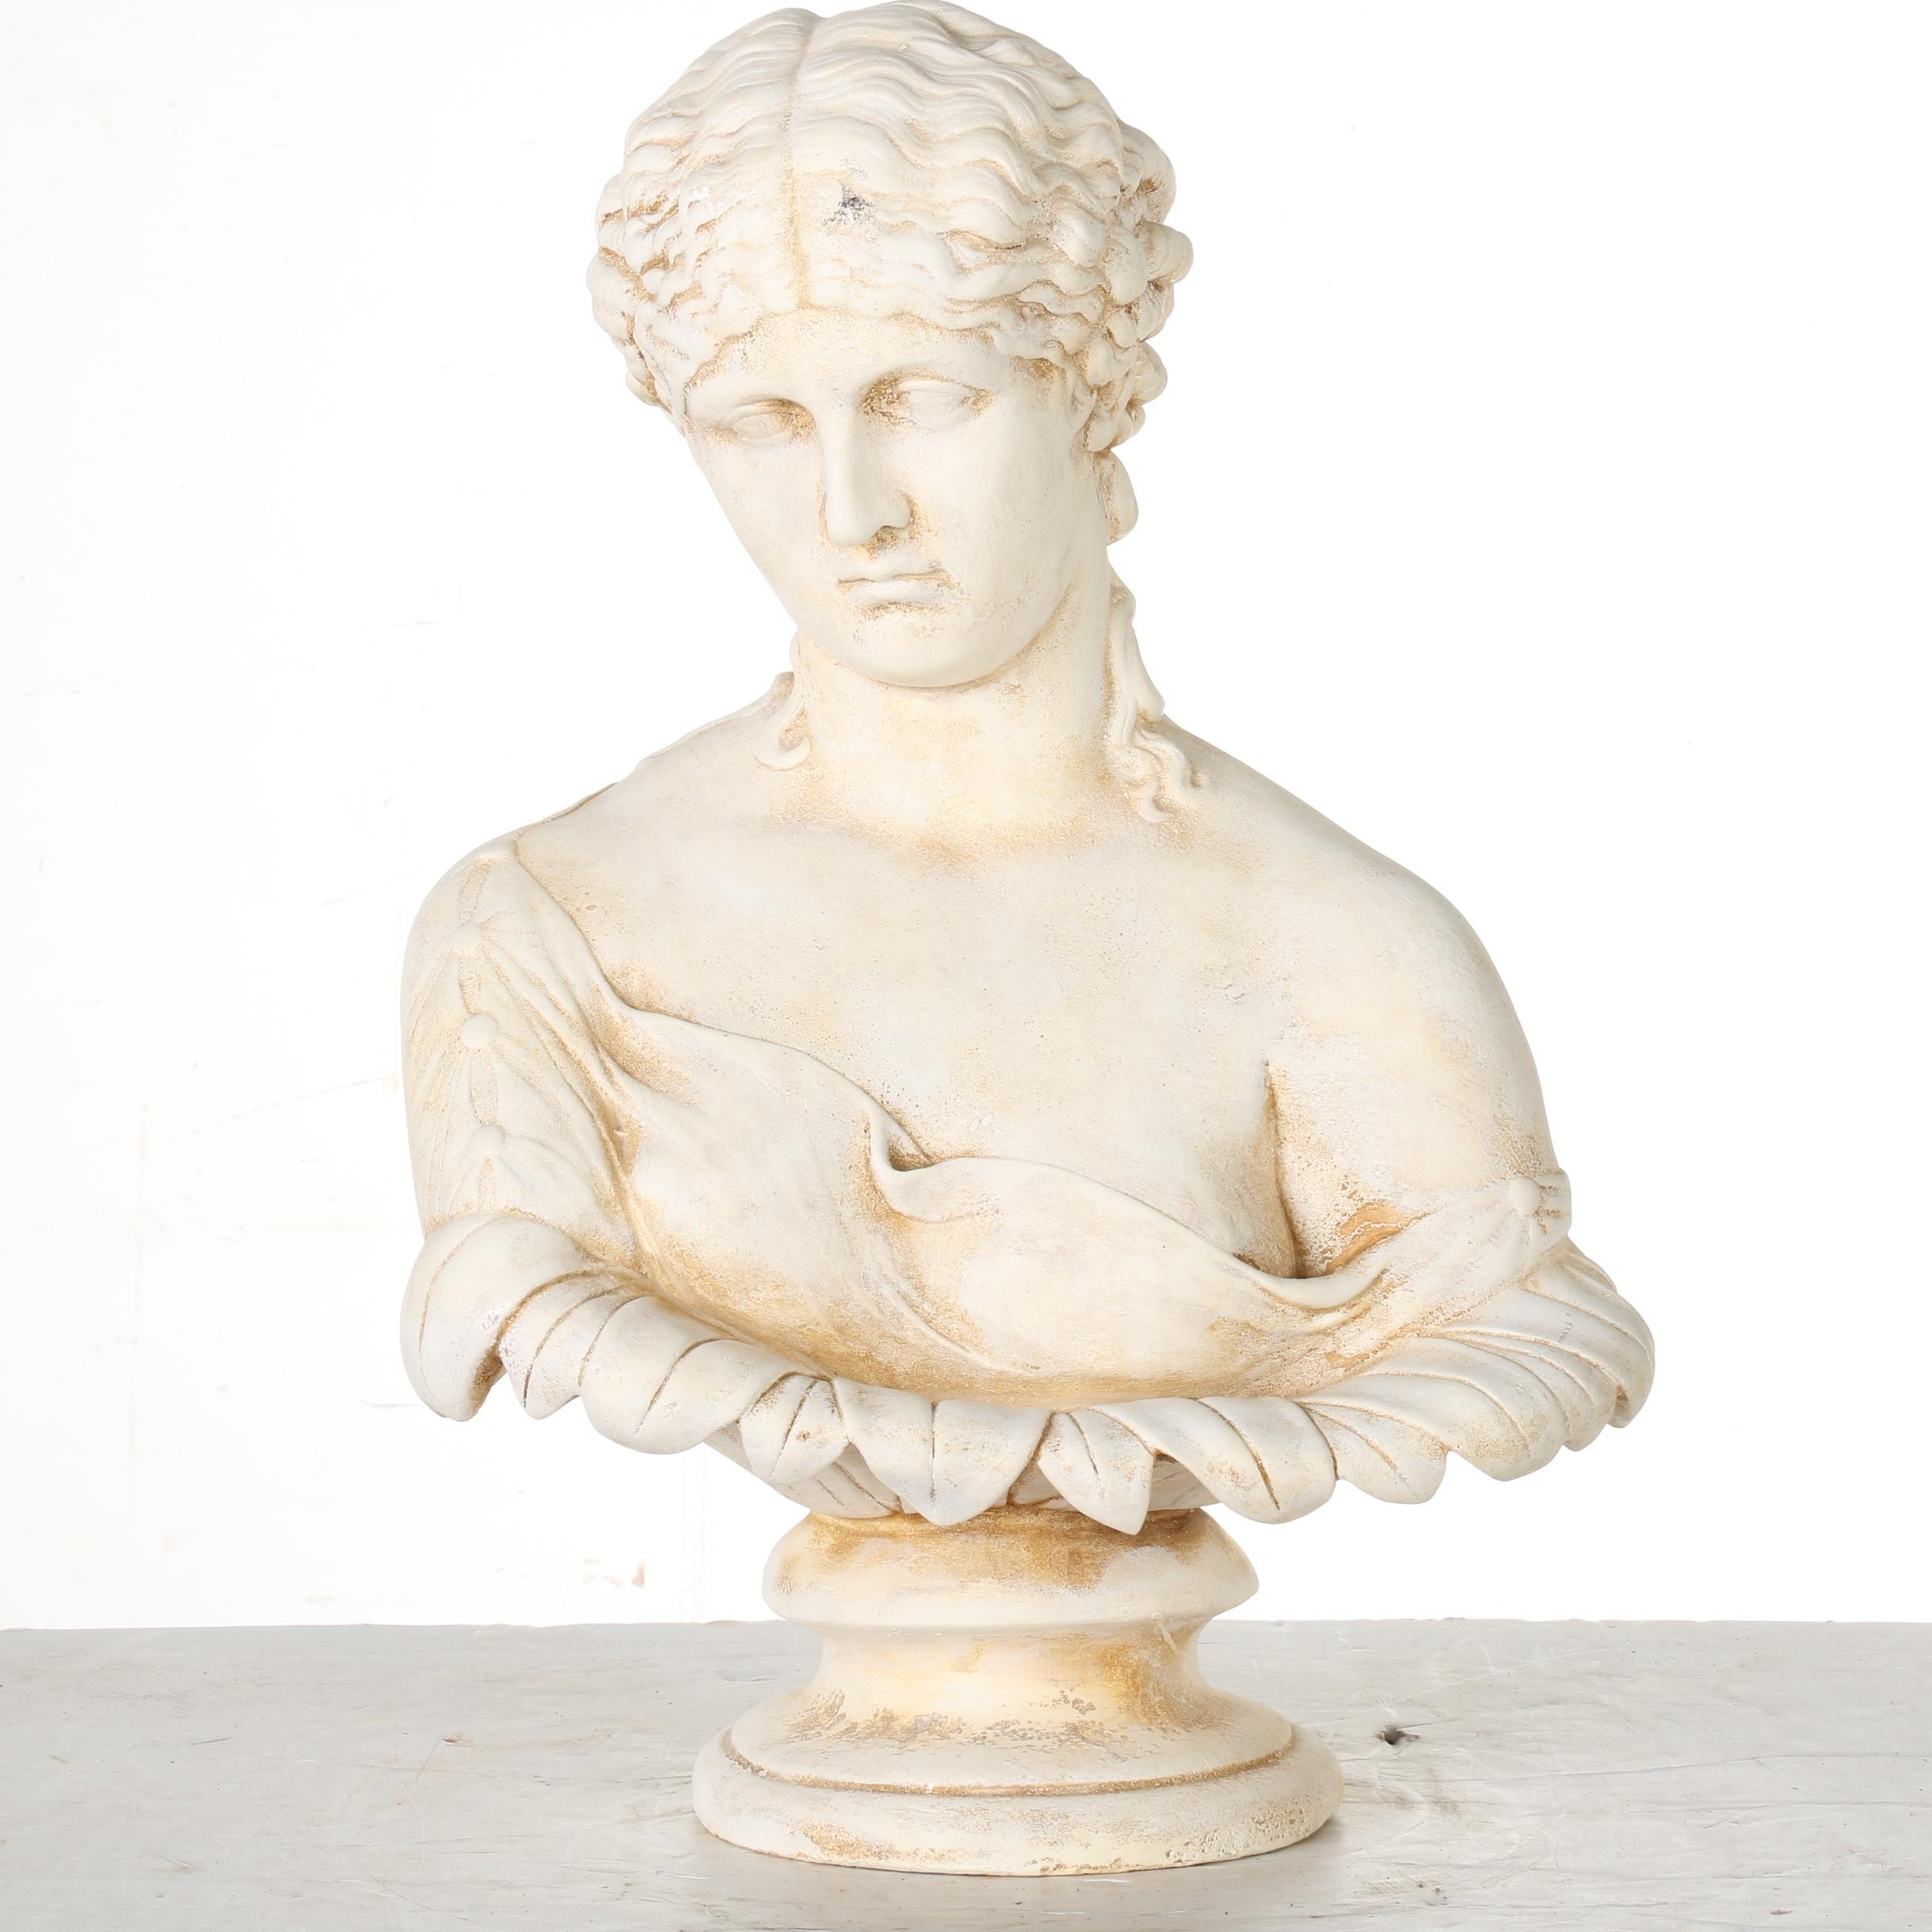 Replica Roman Bust of Antonia